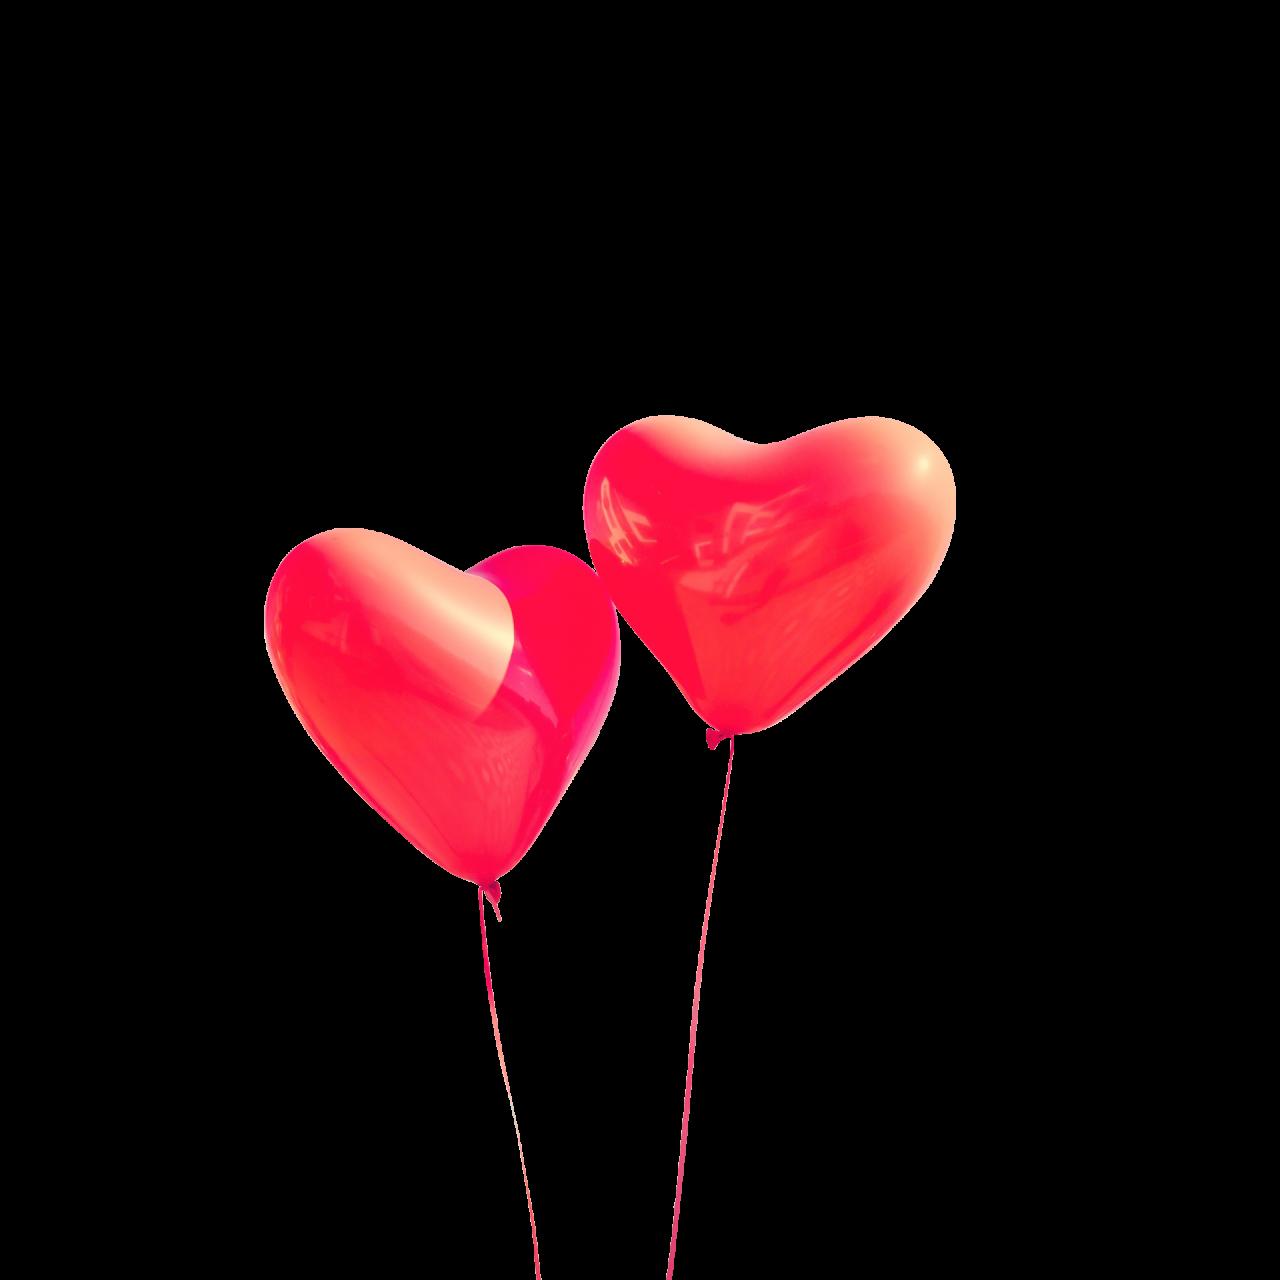 Heart Balloons png